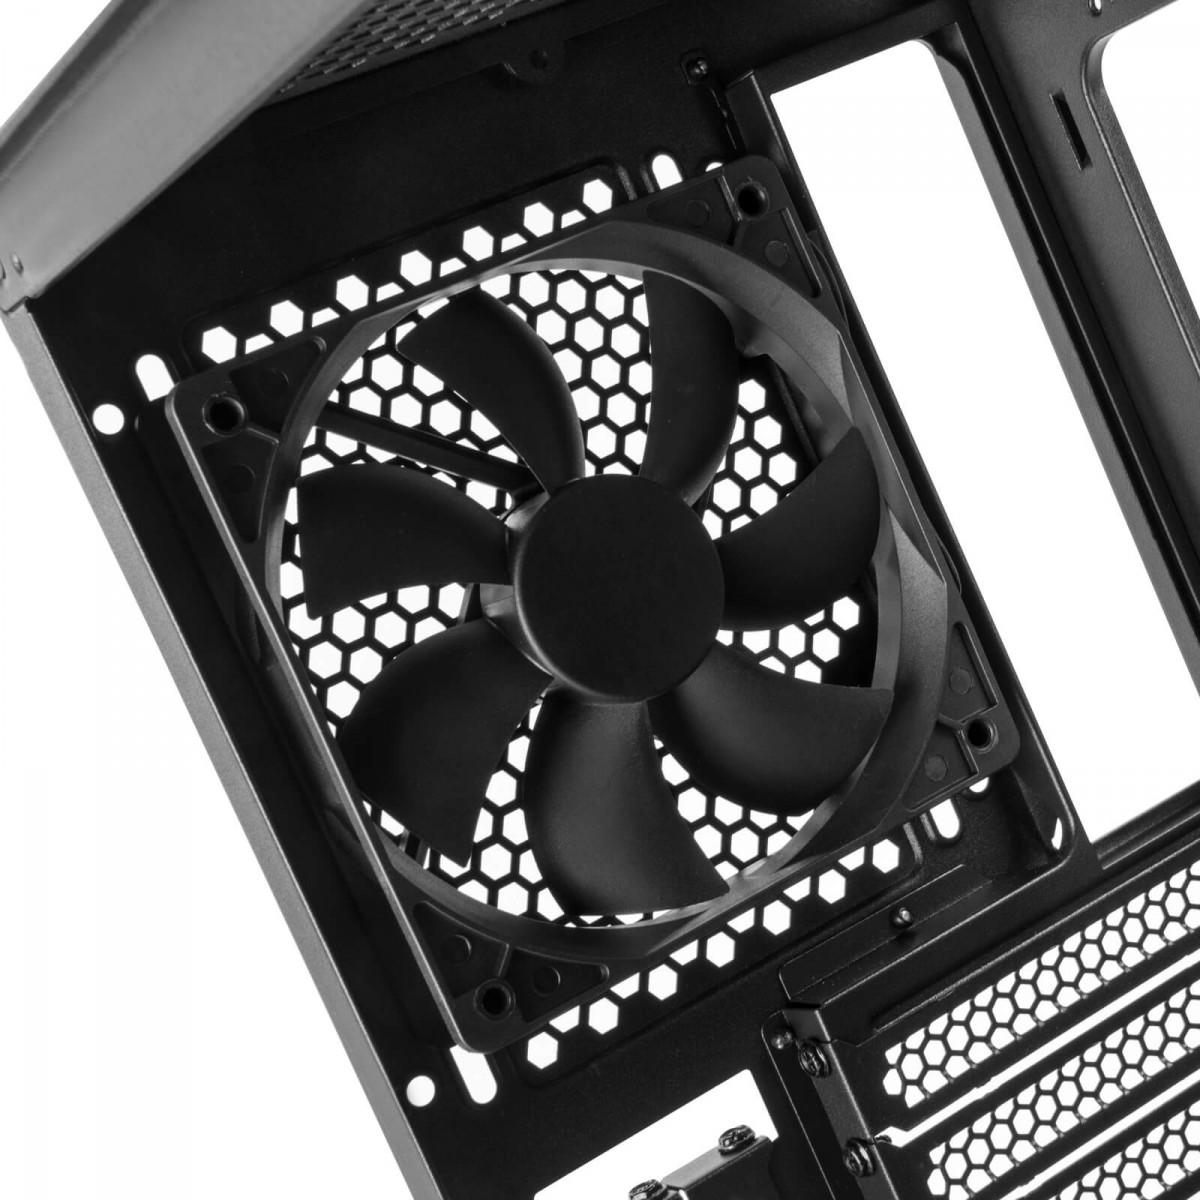 Gabinete Gamer SilverStone Seta A1, Mid Tower, Vidro Temperado, Black, Sem fonte, Com 3 Fans, SST-SEA1TB-G